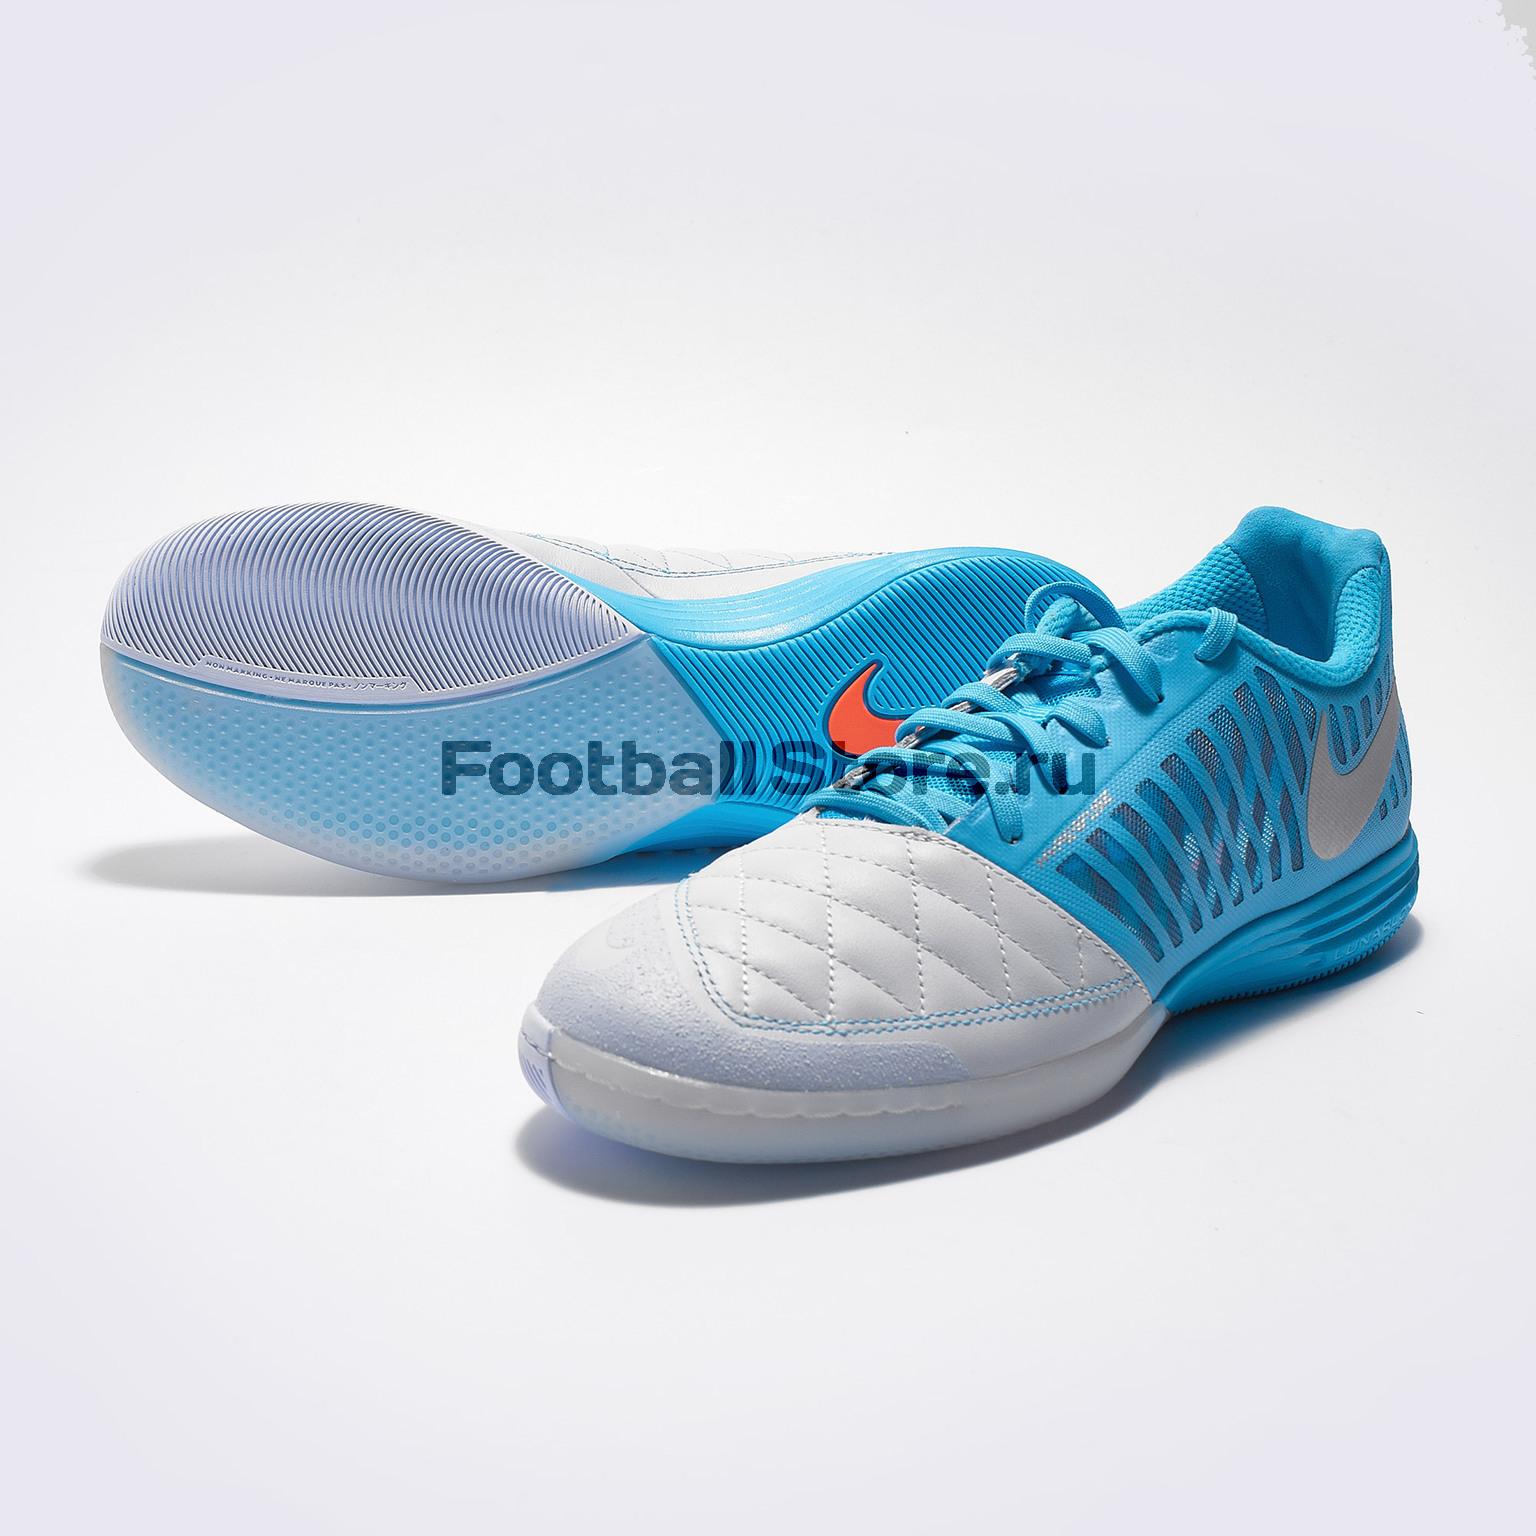 Футзалки Nike LunarGato II 580456-404 футзалки nike tiempo premier ii sala av3153 010